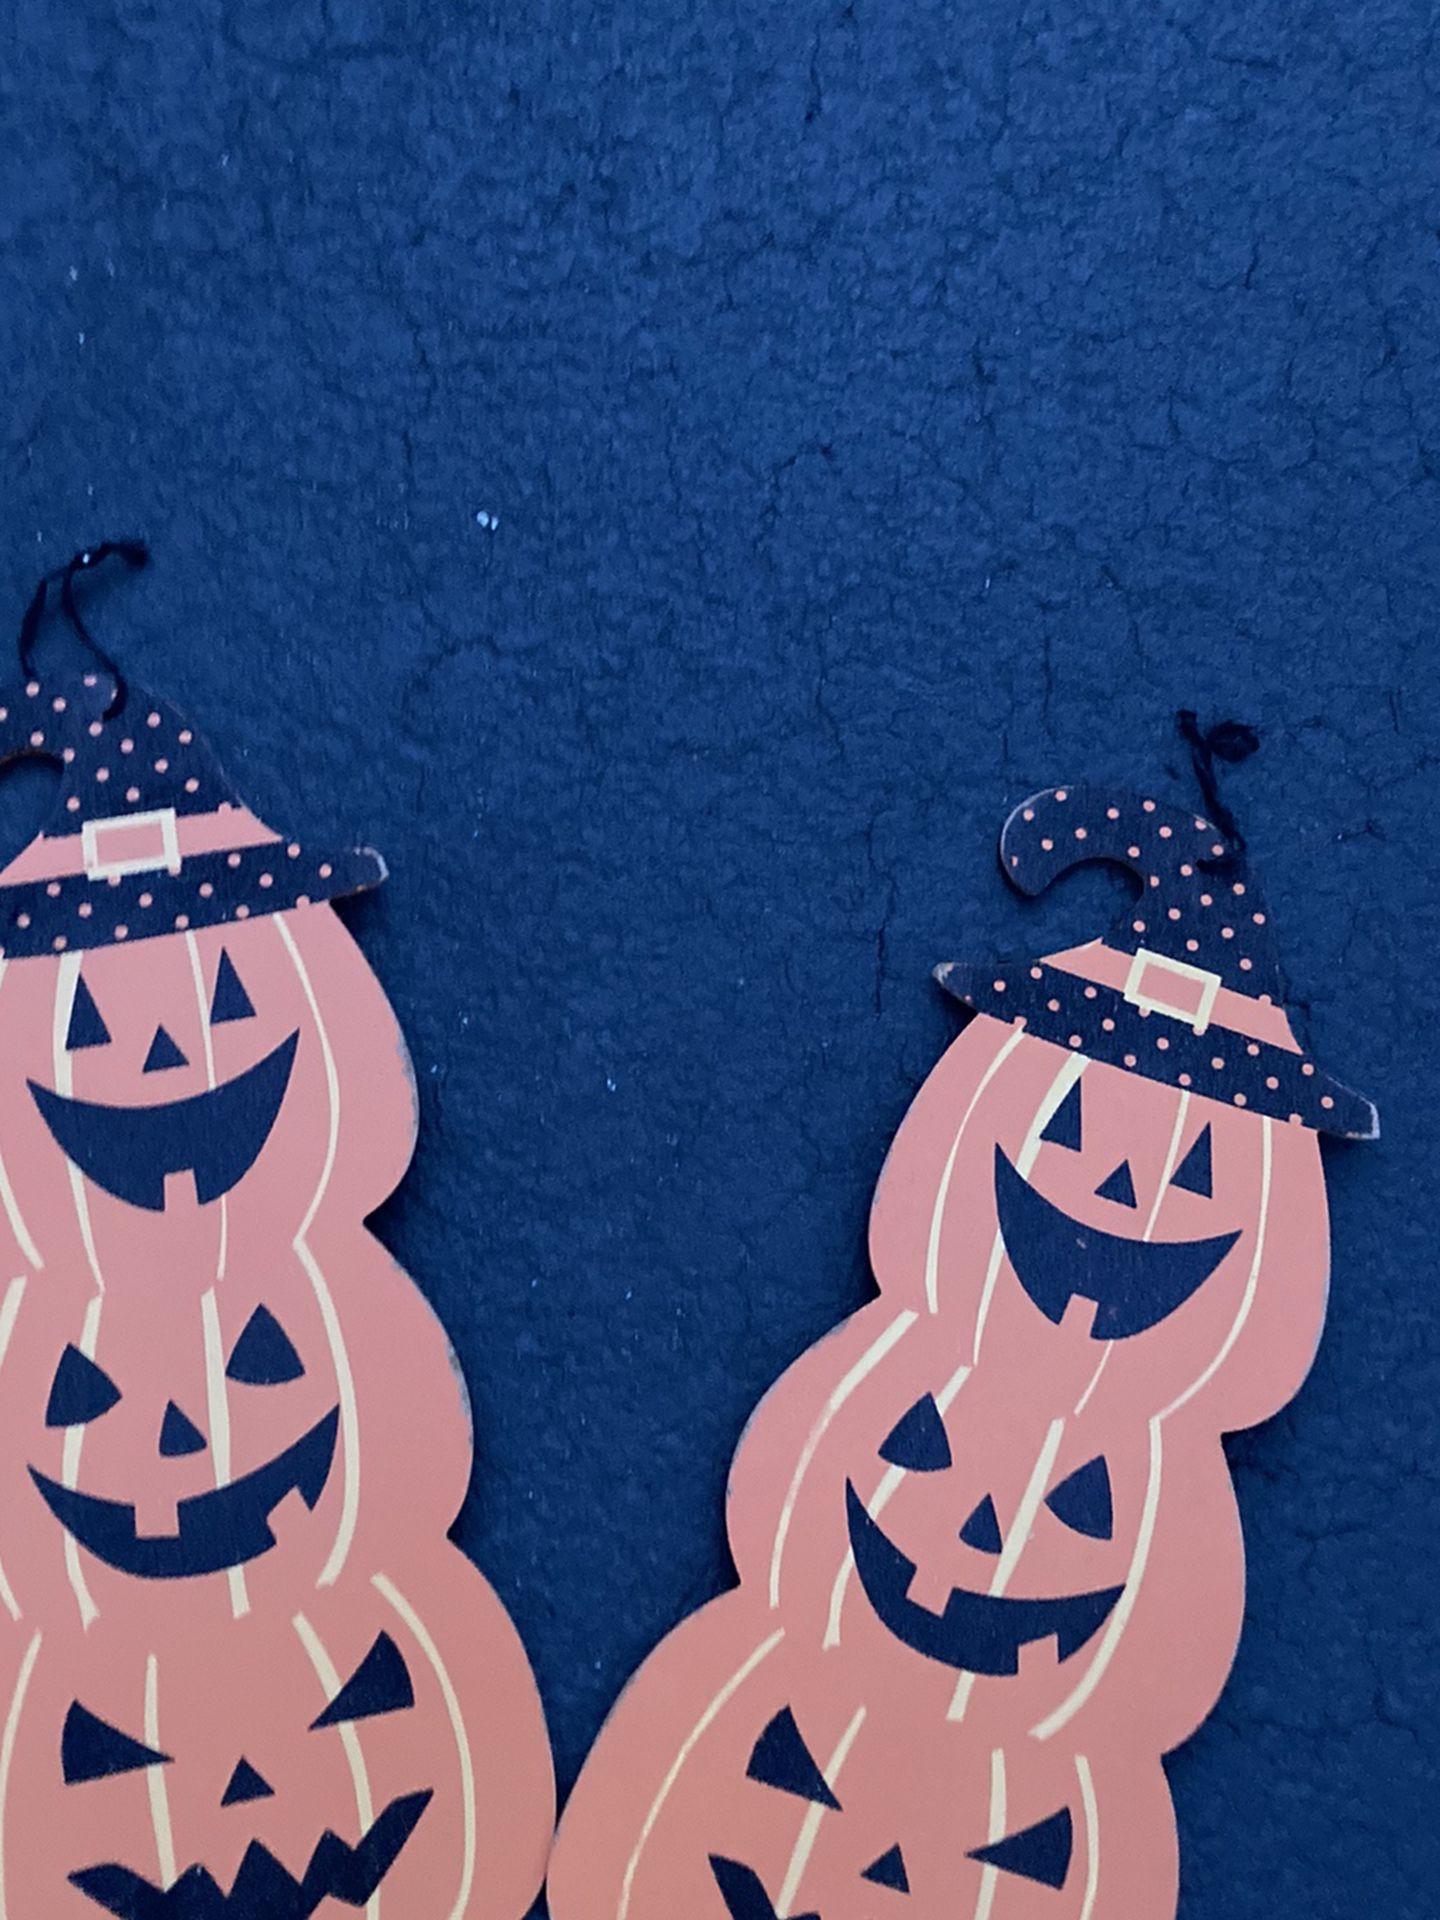 Two topiary pumpkin wall hangers